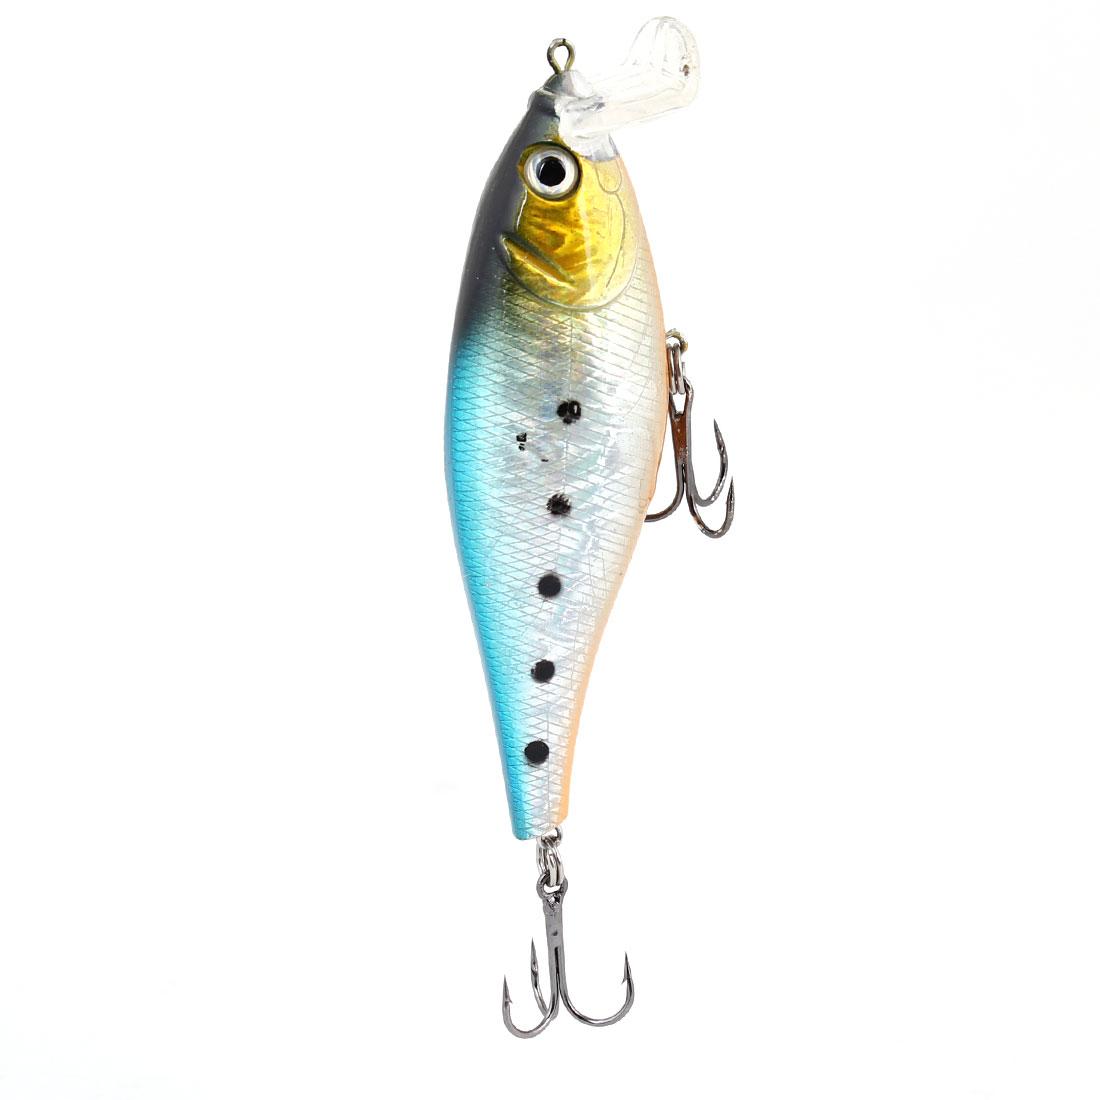 Multicolored Plastic Fish Shaped Lure Bait Metal Fishing Triple Hooks Fishhook